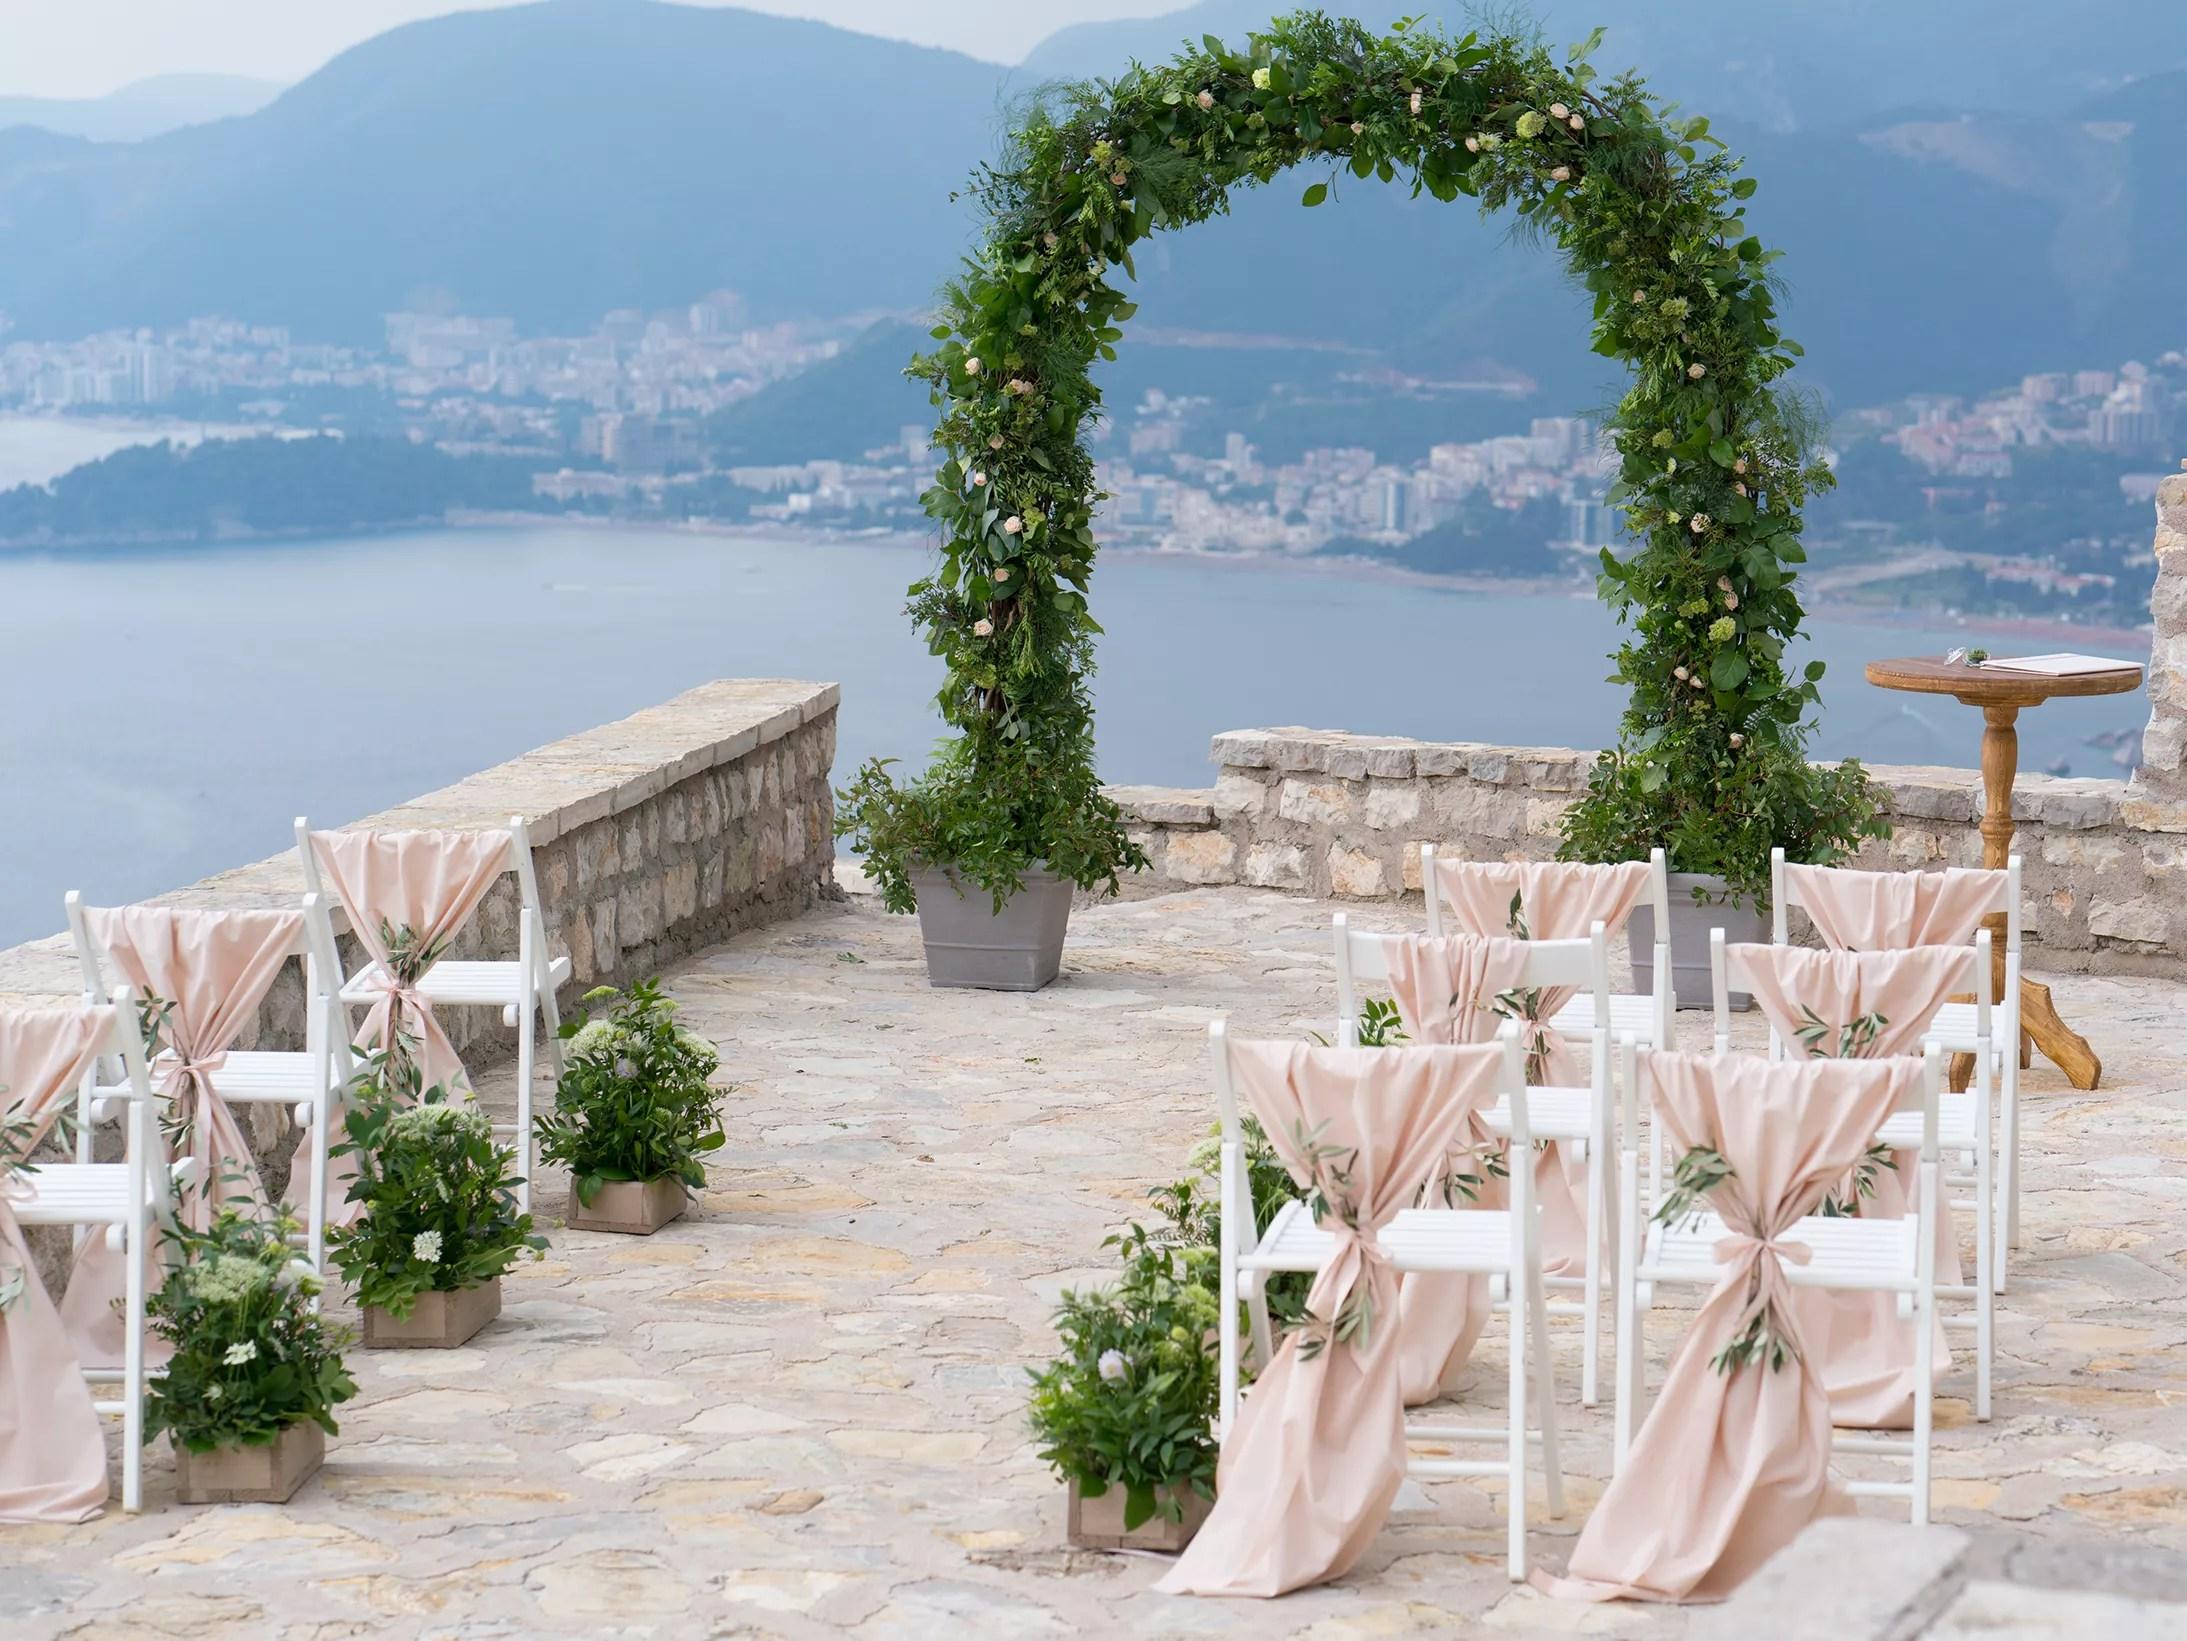 28 Beautiful Wedding Aisle Decorations And Ideas